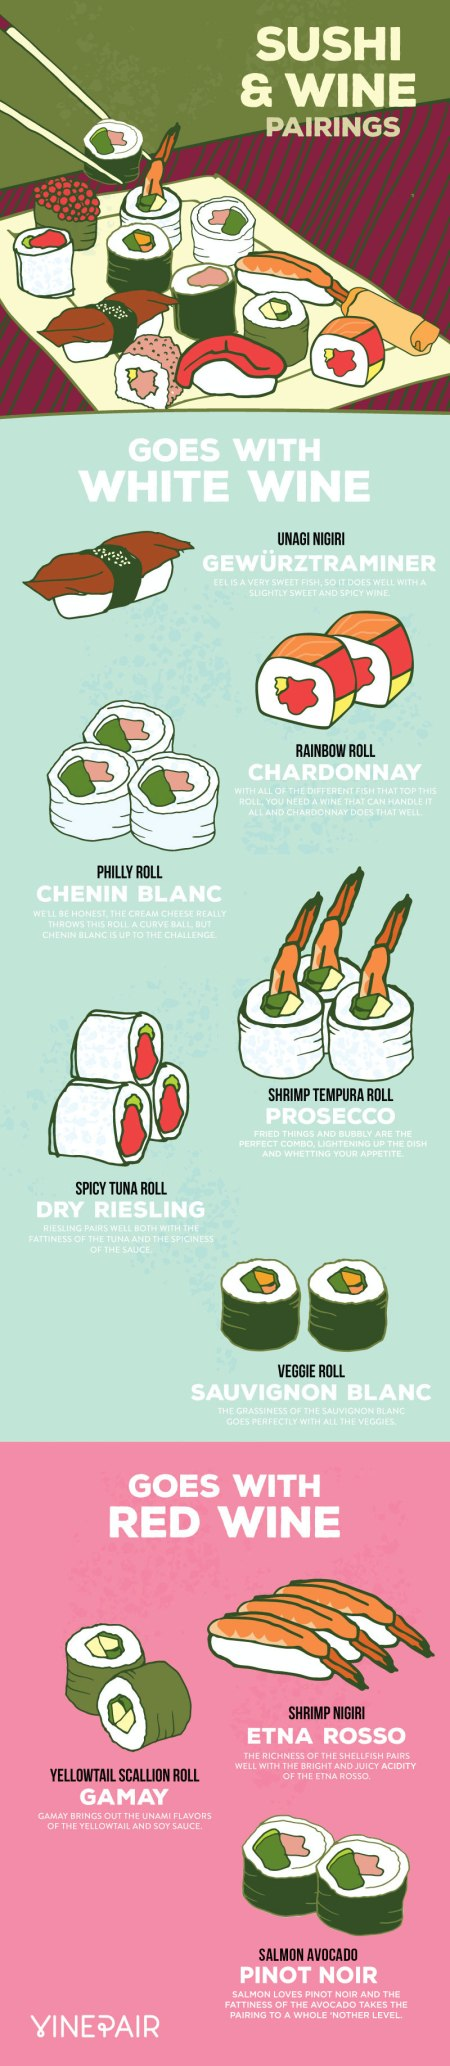 5-sushi-franklin-liquors